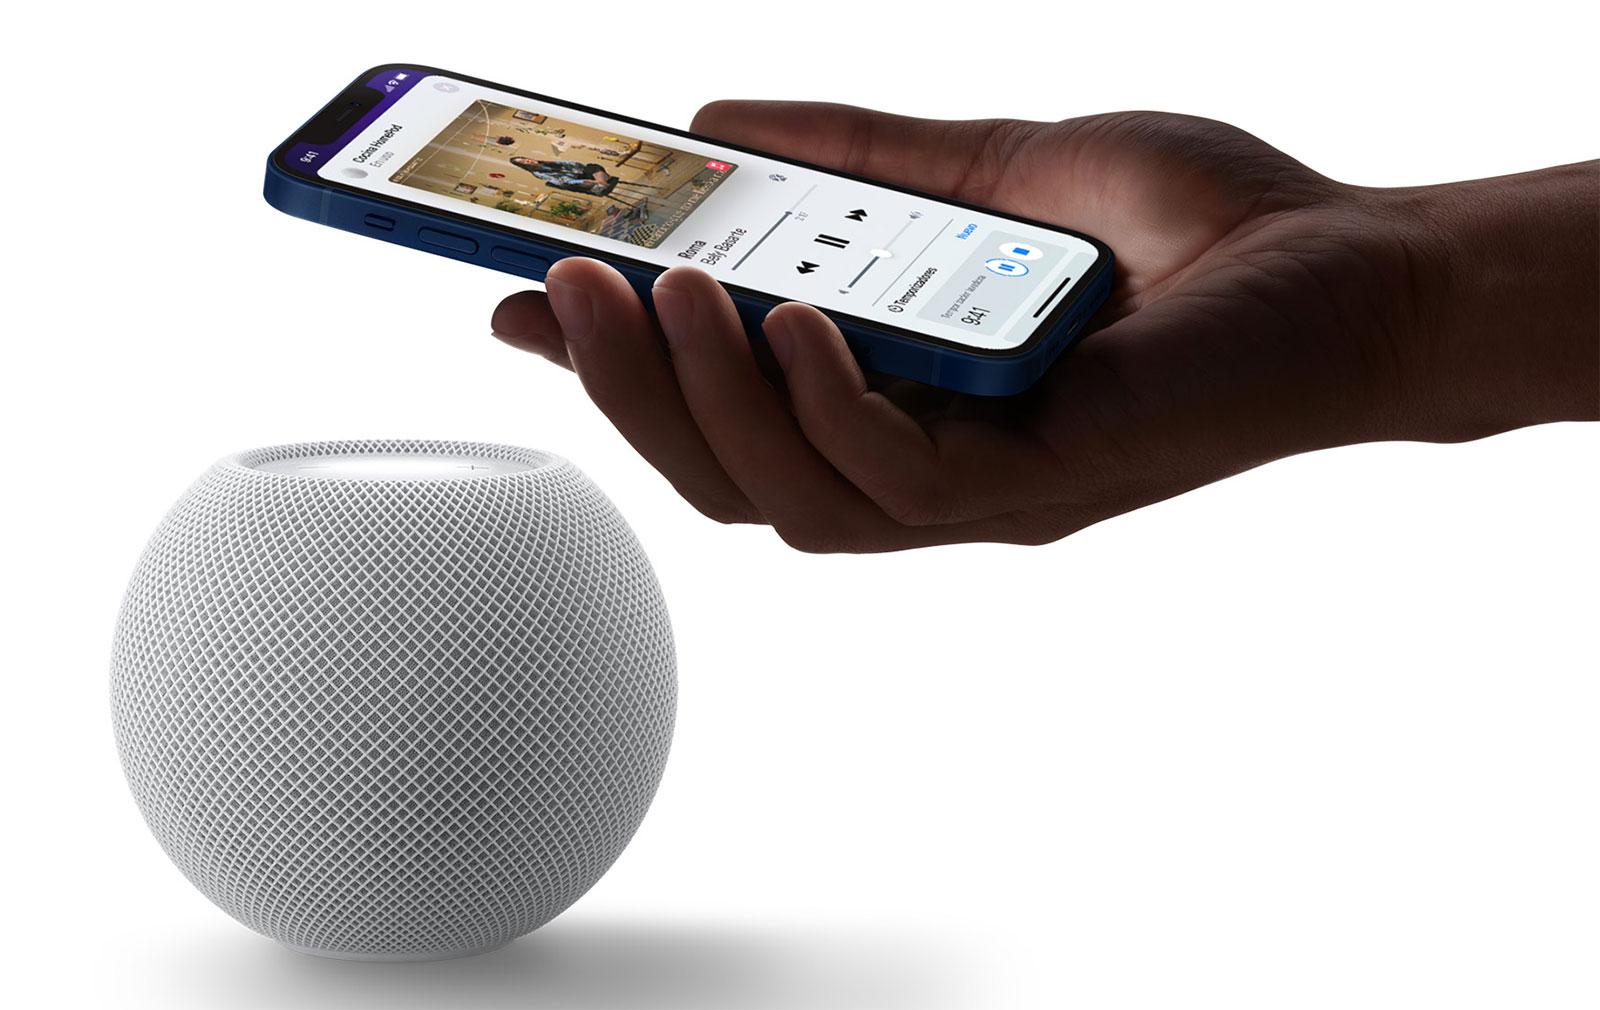 iPhone cerca del HomePod mini, utilizando el chip U1 Ultra Wideband